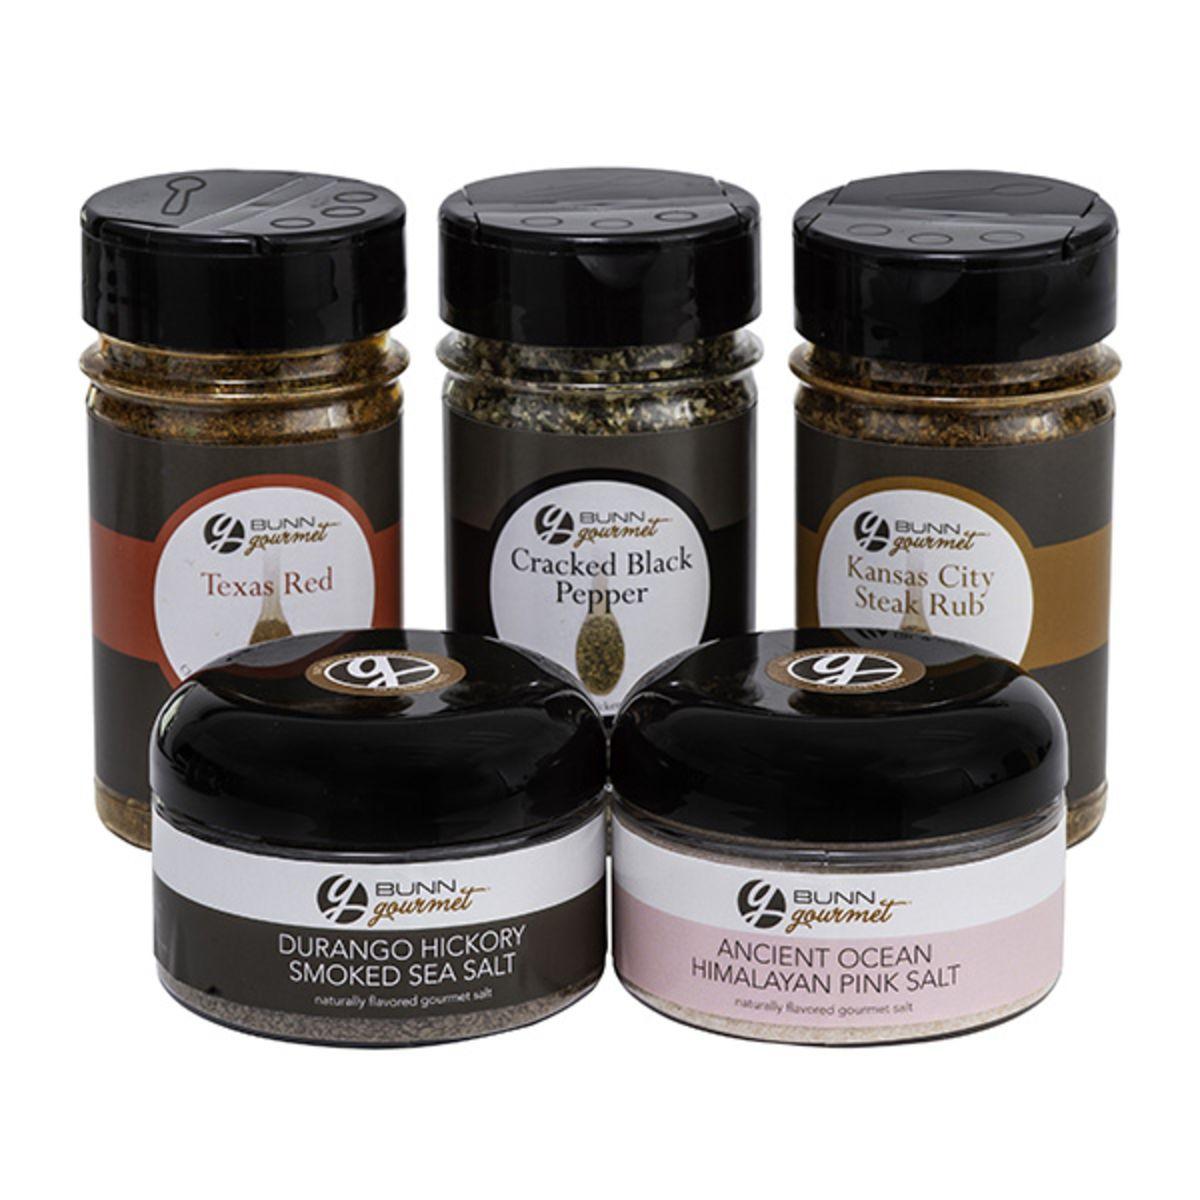 BUNN Gourmet Sizzle & Savor Spices Collection